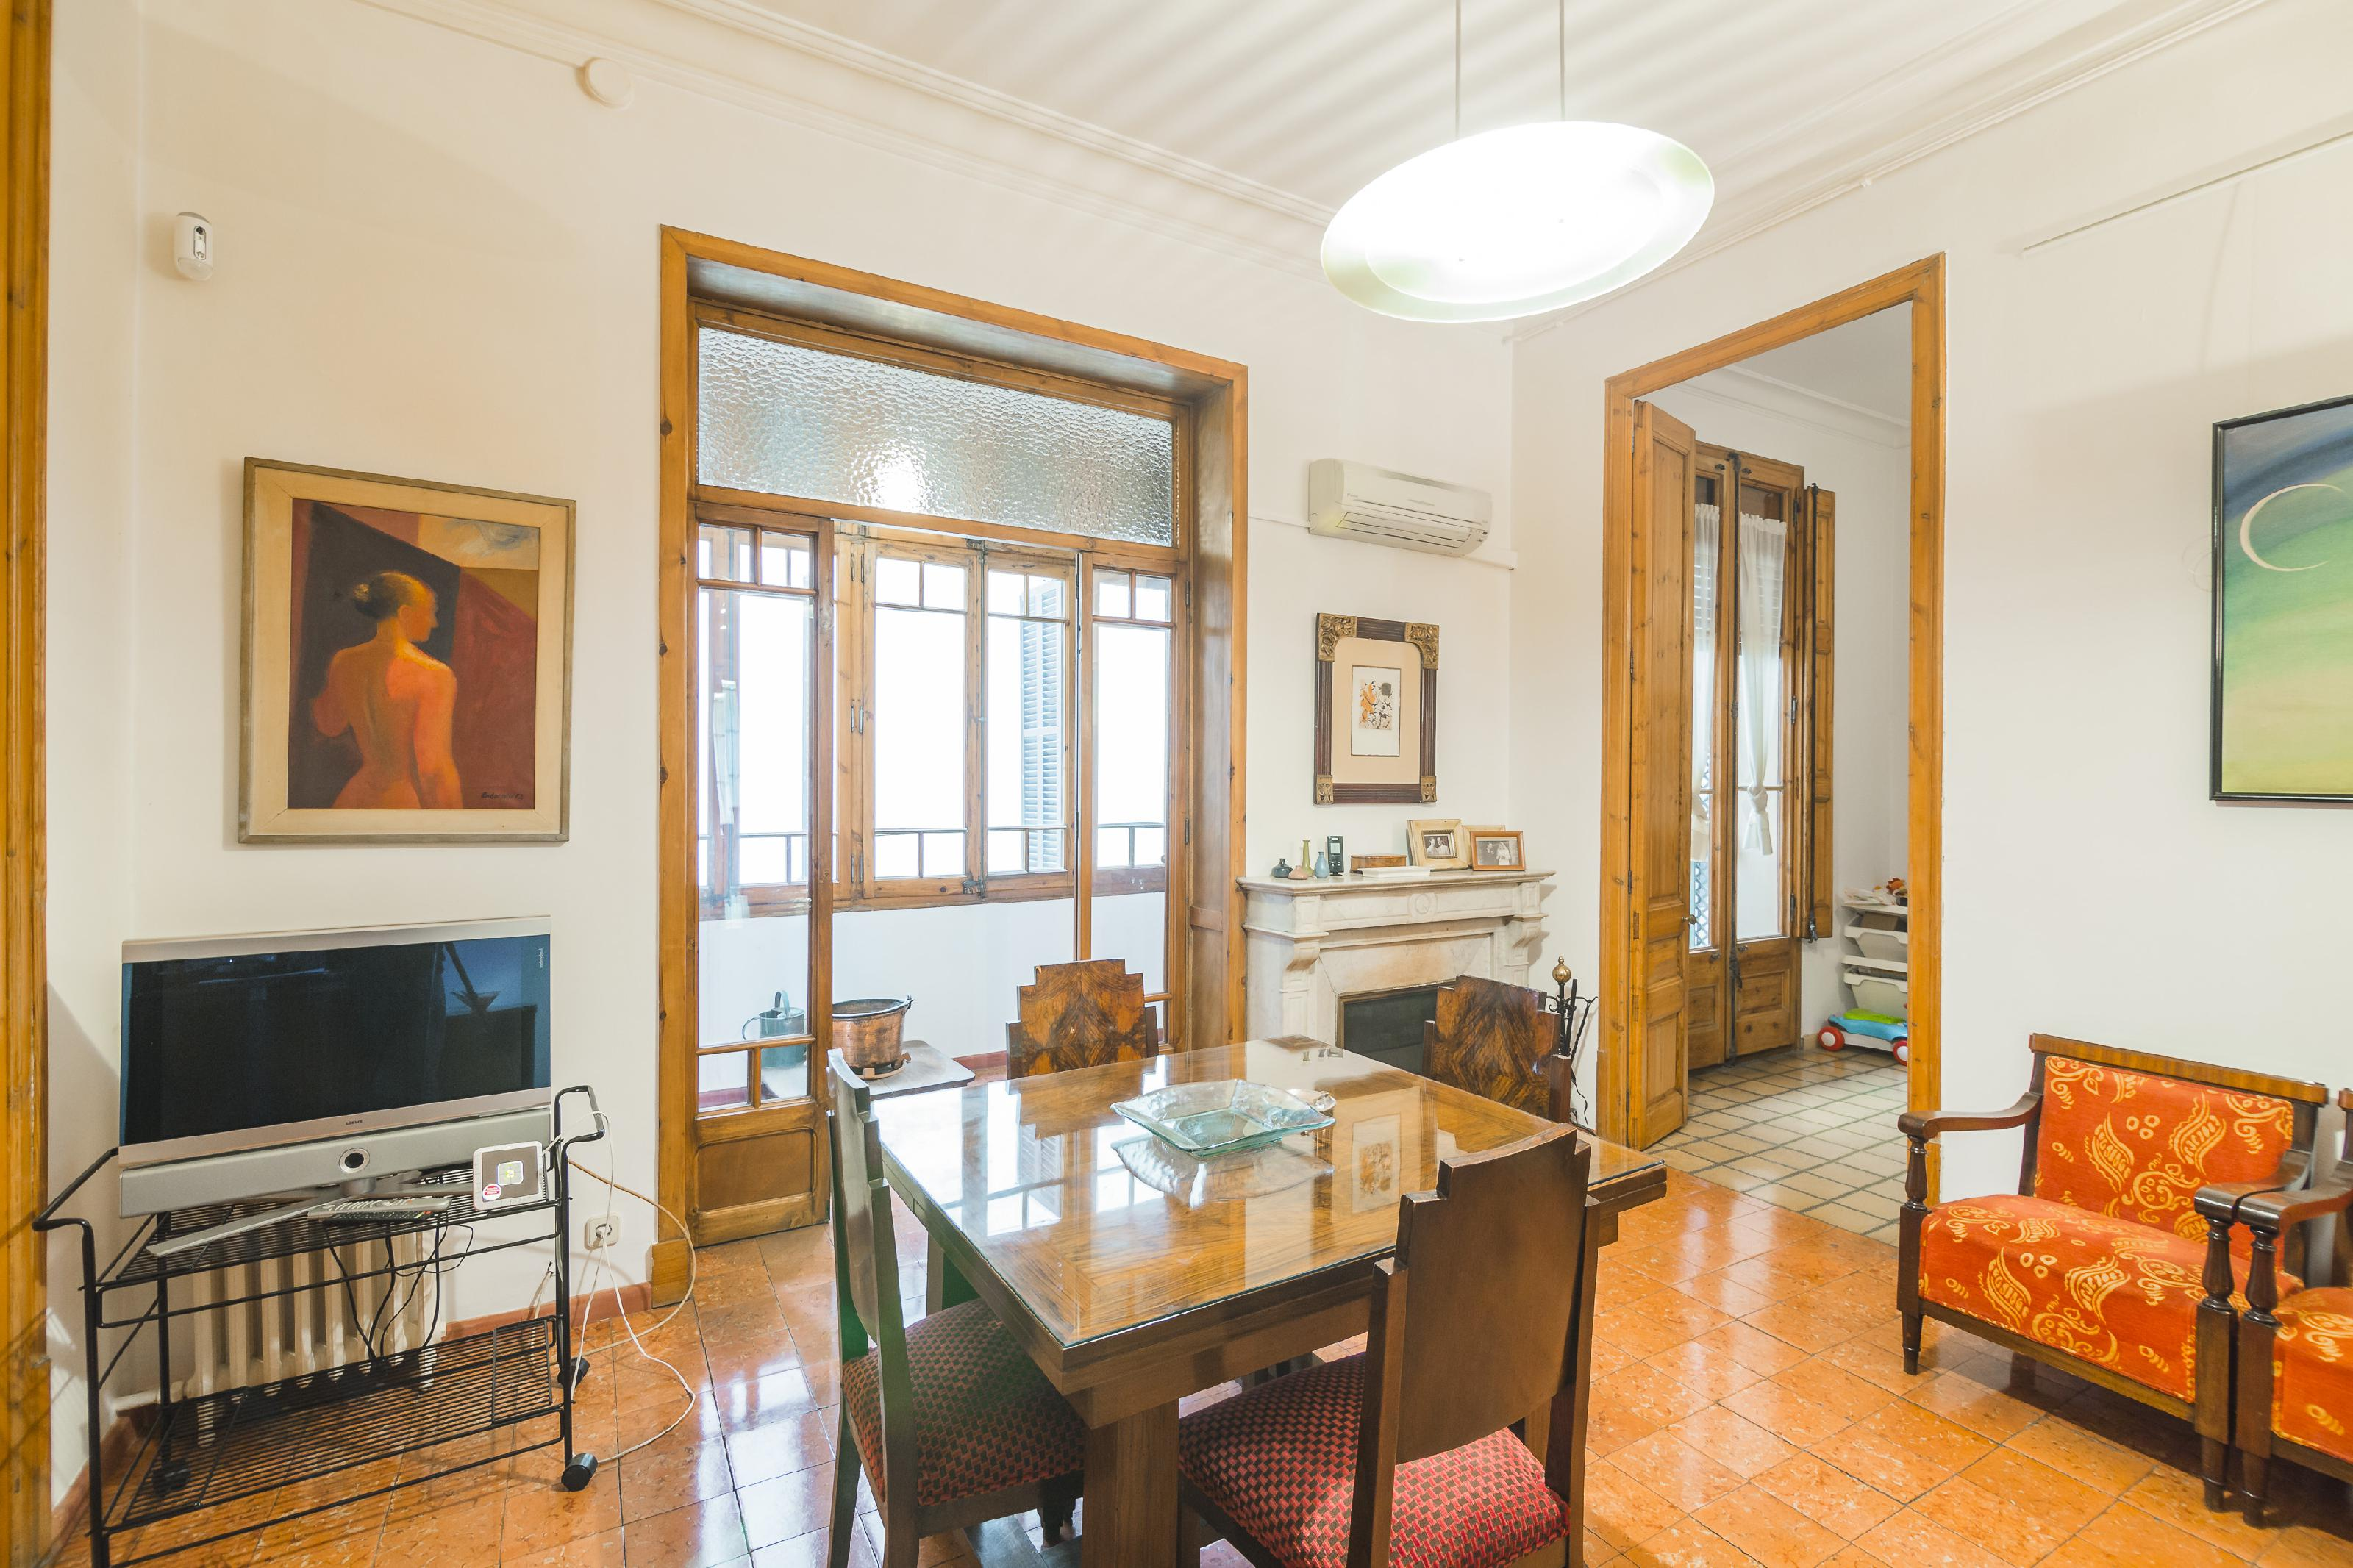 250020 Piso en venda en Gràcia, Vila de Gràcia 19